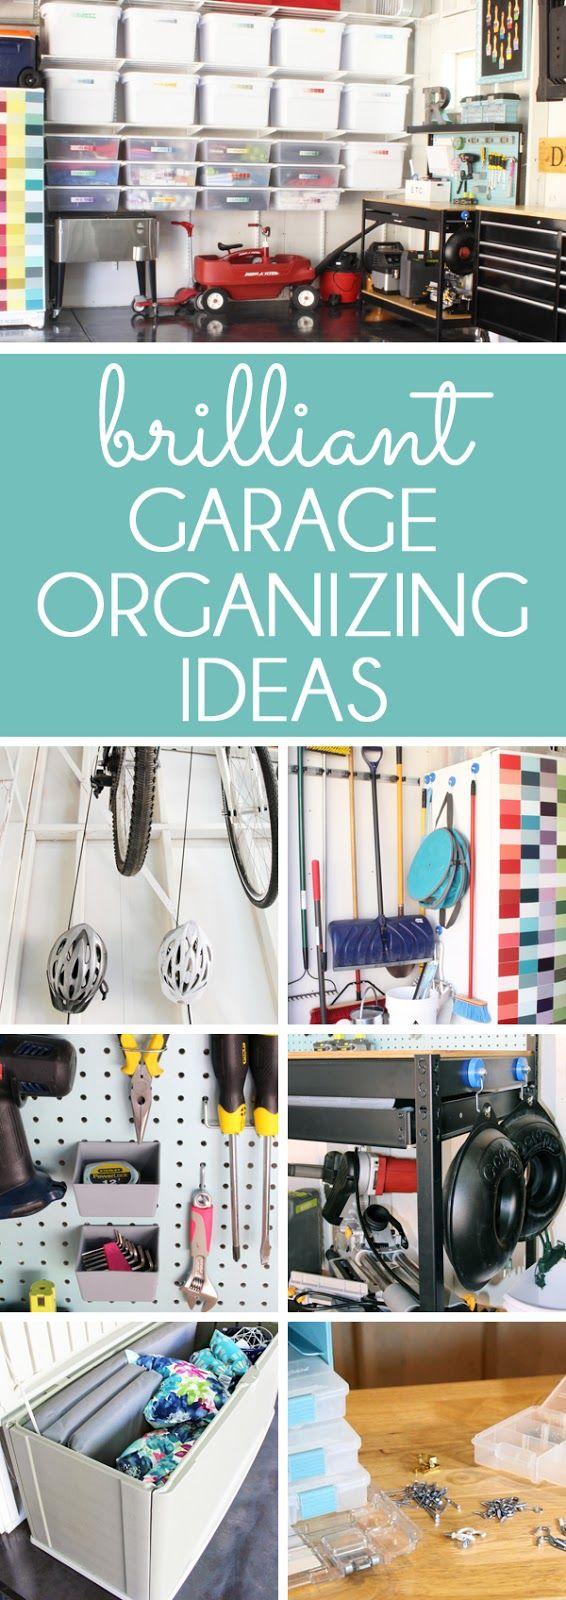 Photo of Brilliant Ways to Organize the Garage